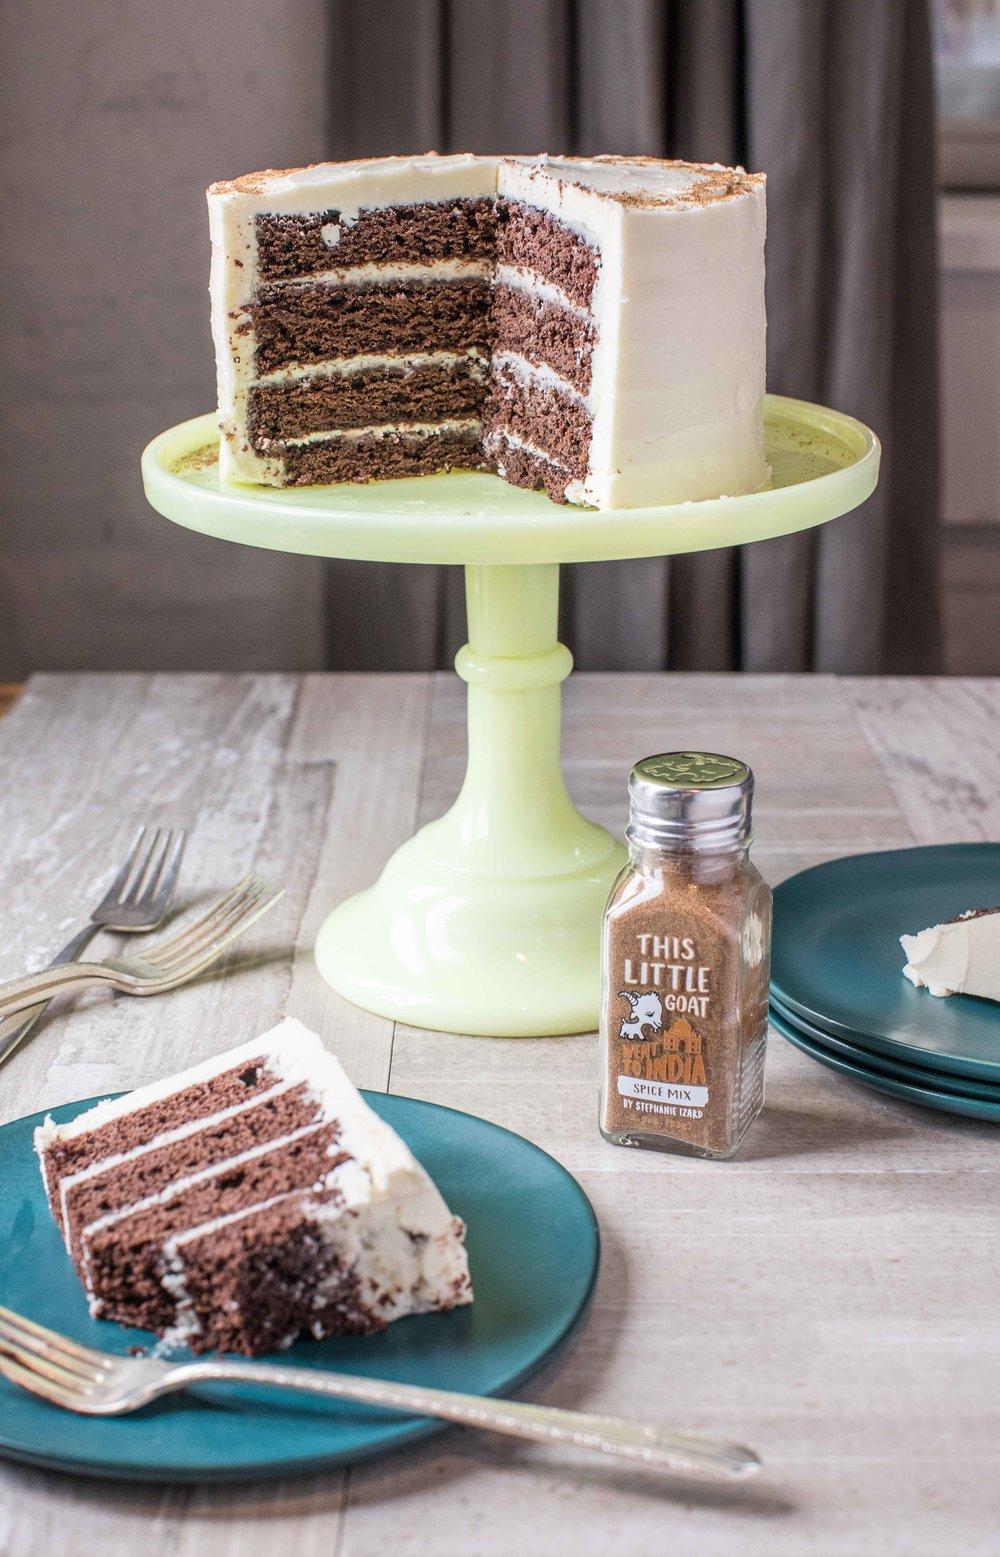 tlg_spiced_cake-5.jpg